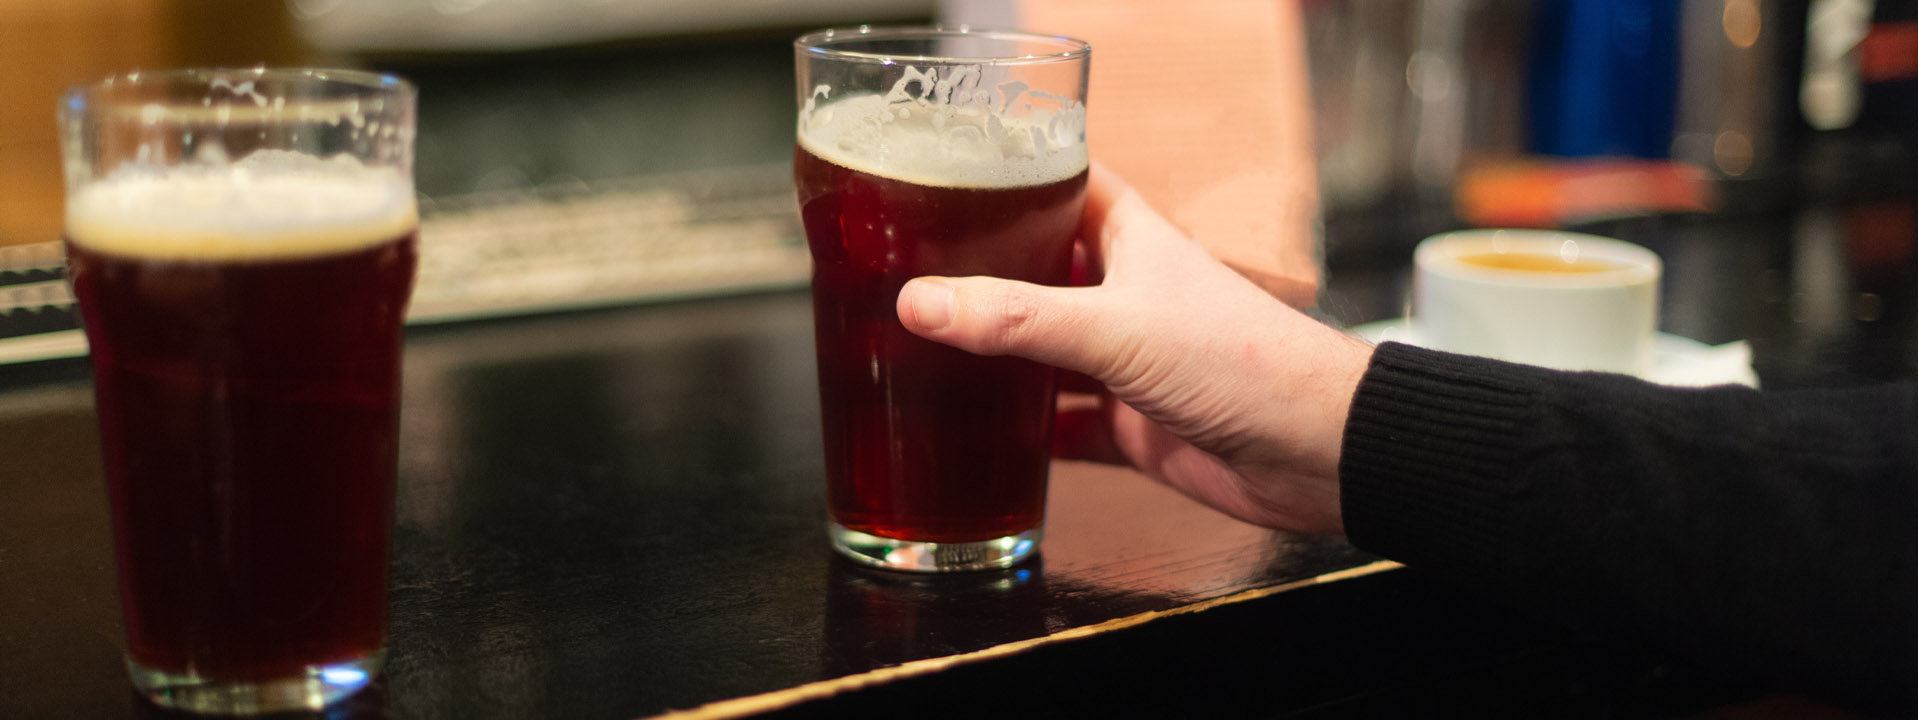 Green Bay Breweries